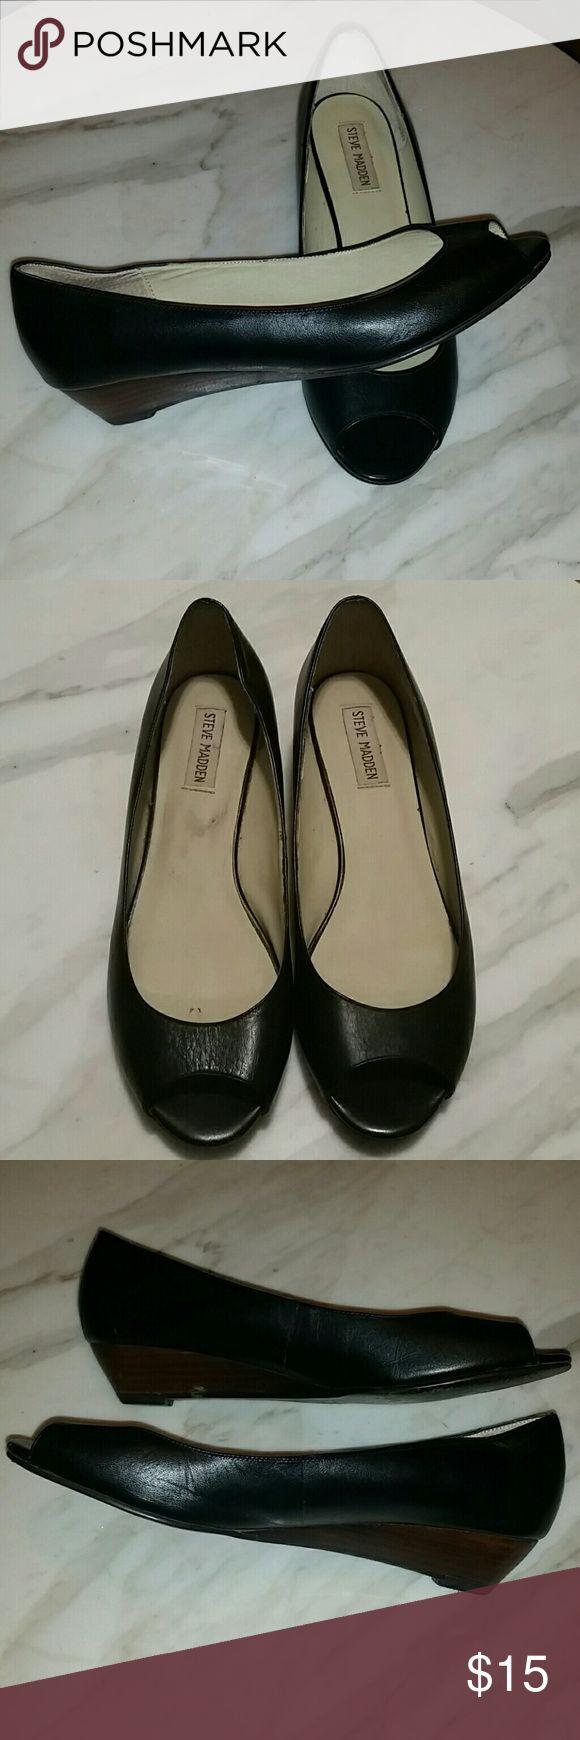 Steve Madden peep toe wedge heel Black peep toe shoe with a  brown wedge heel.  Slight wear on the backs of shoe. Steve Madden Shoes Wedges